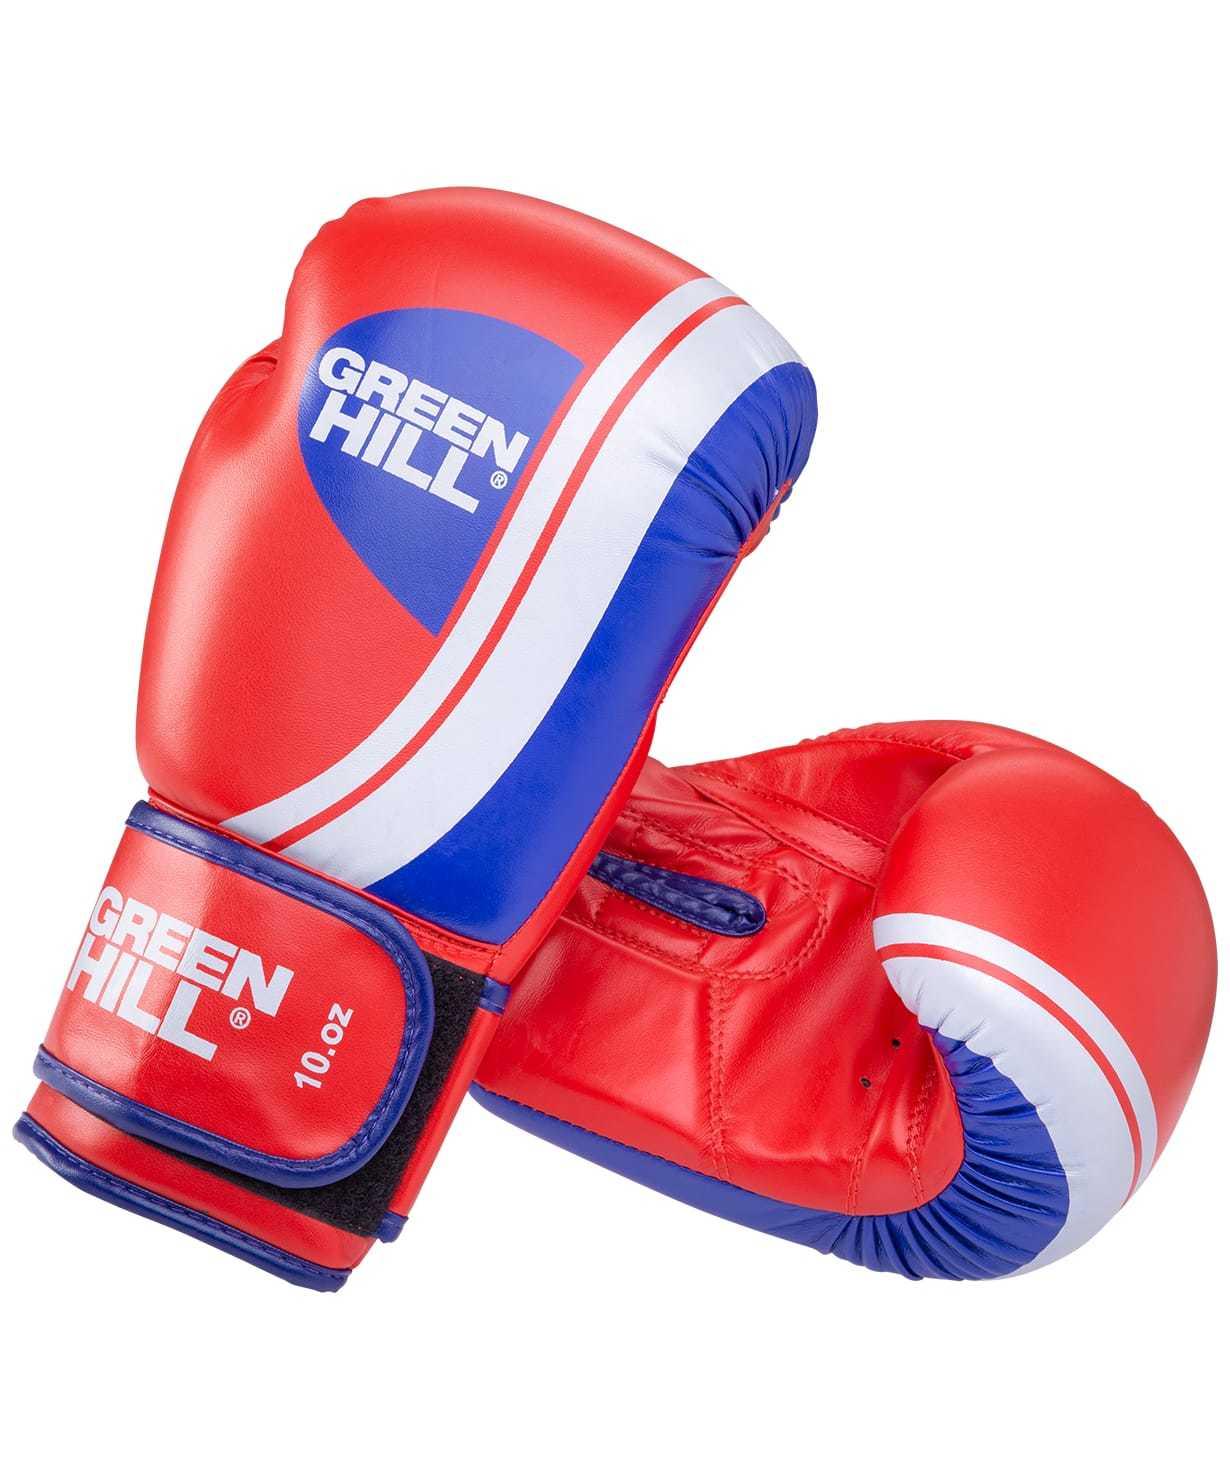 Перчатки Перчатки боксерские Knockout 490bd3a0ffe7581e9f72720c66a748e1.jpg